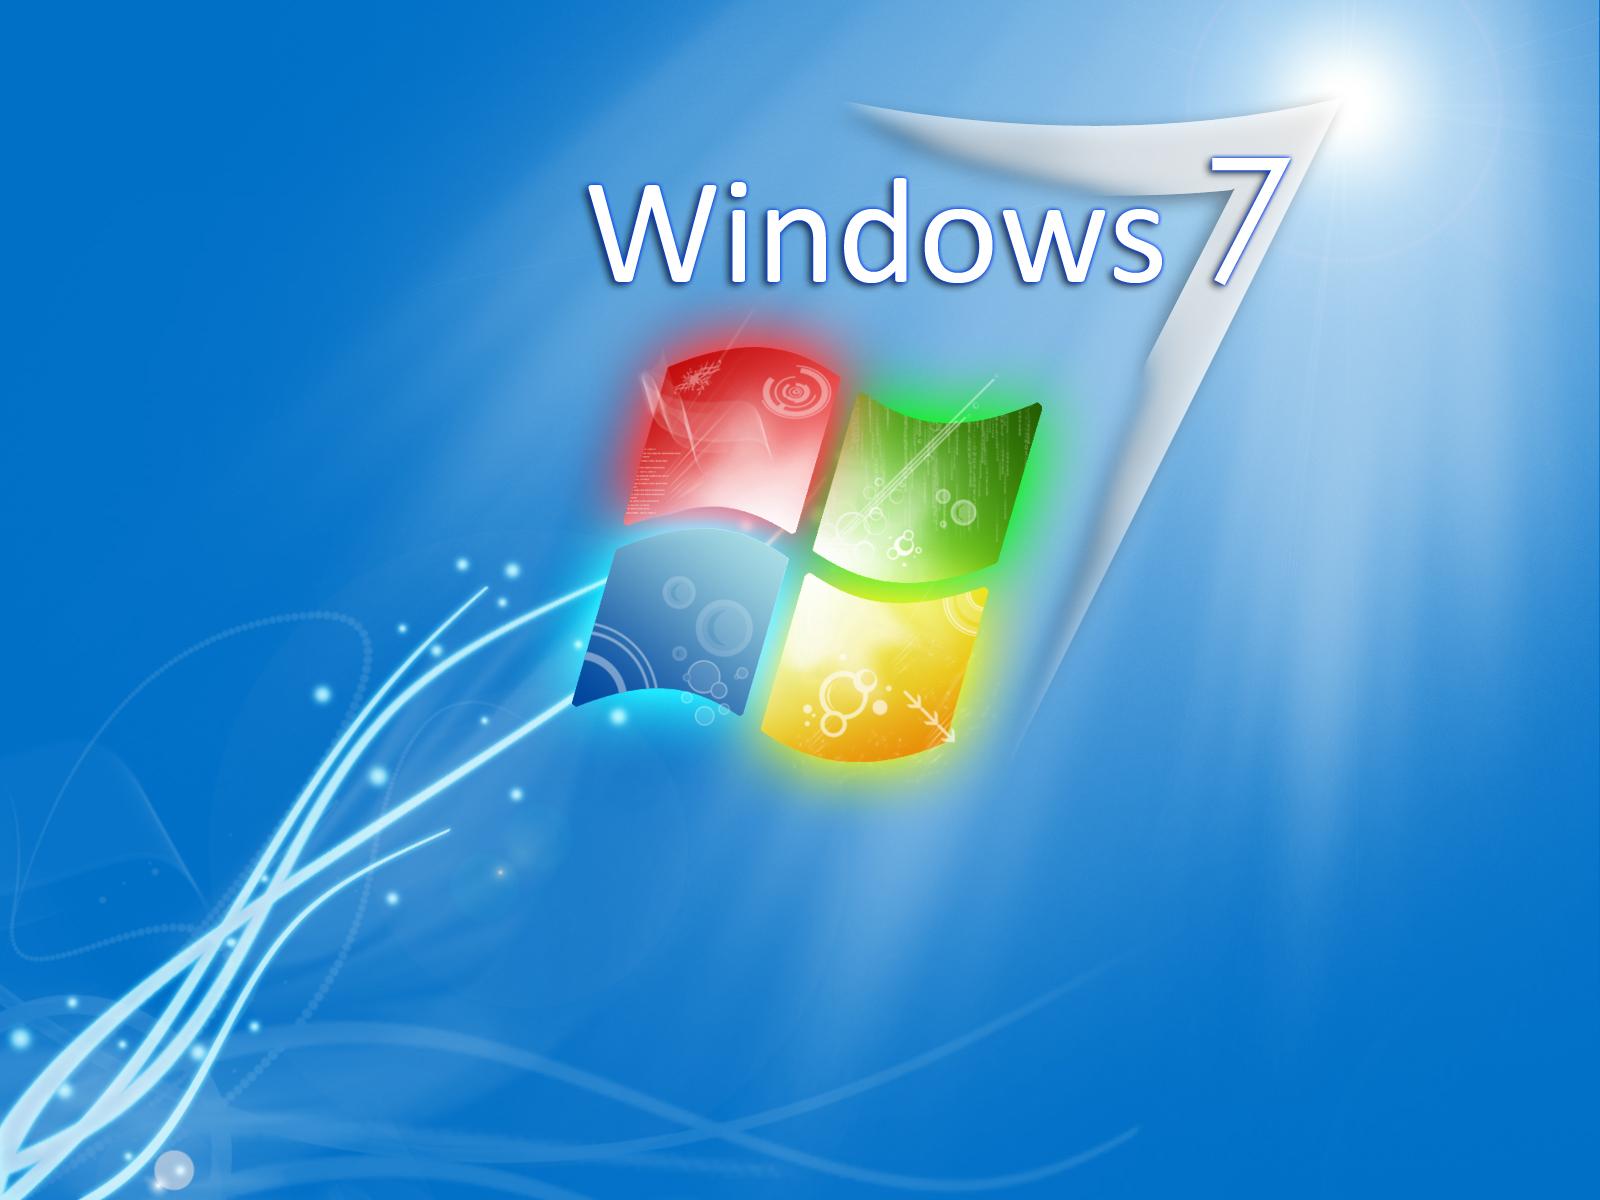 windows 7 desktop backgrounds 015